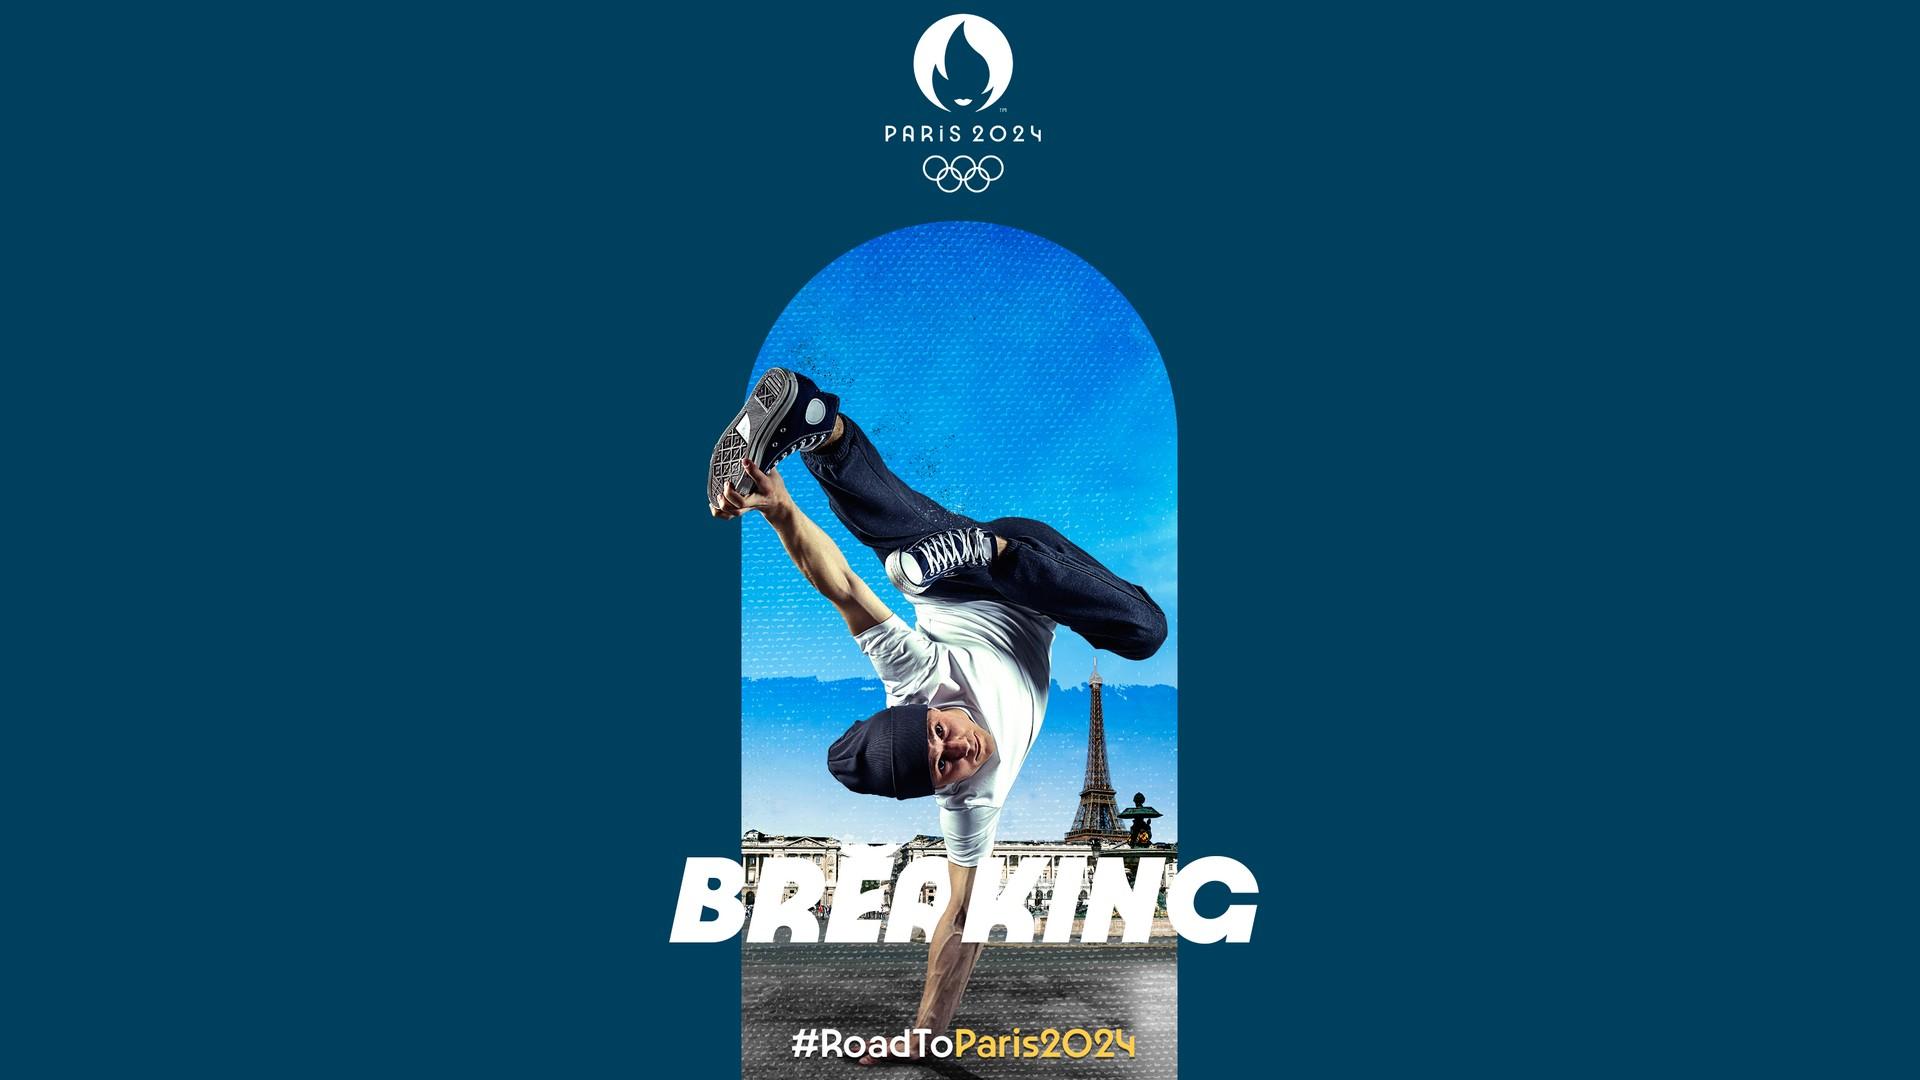 FF Danse x Breaking Paris 2024